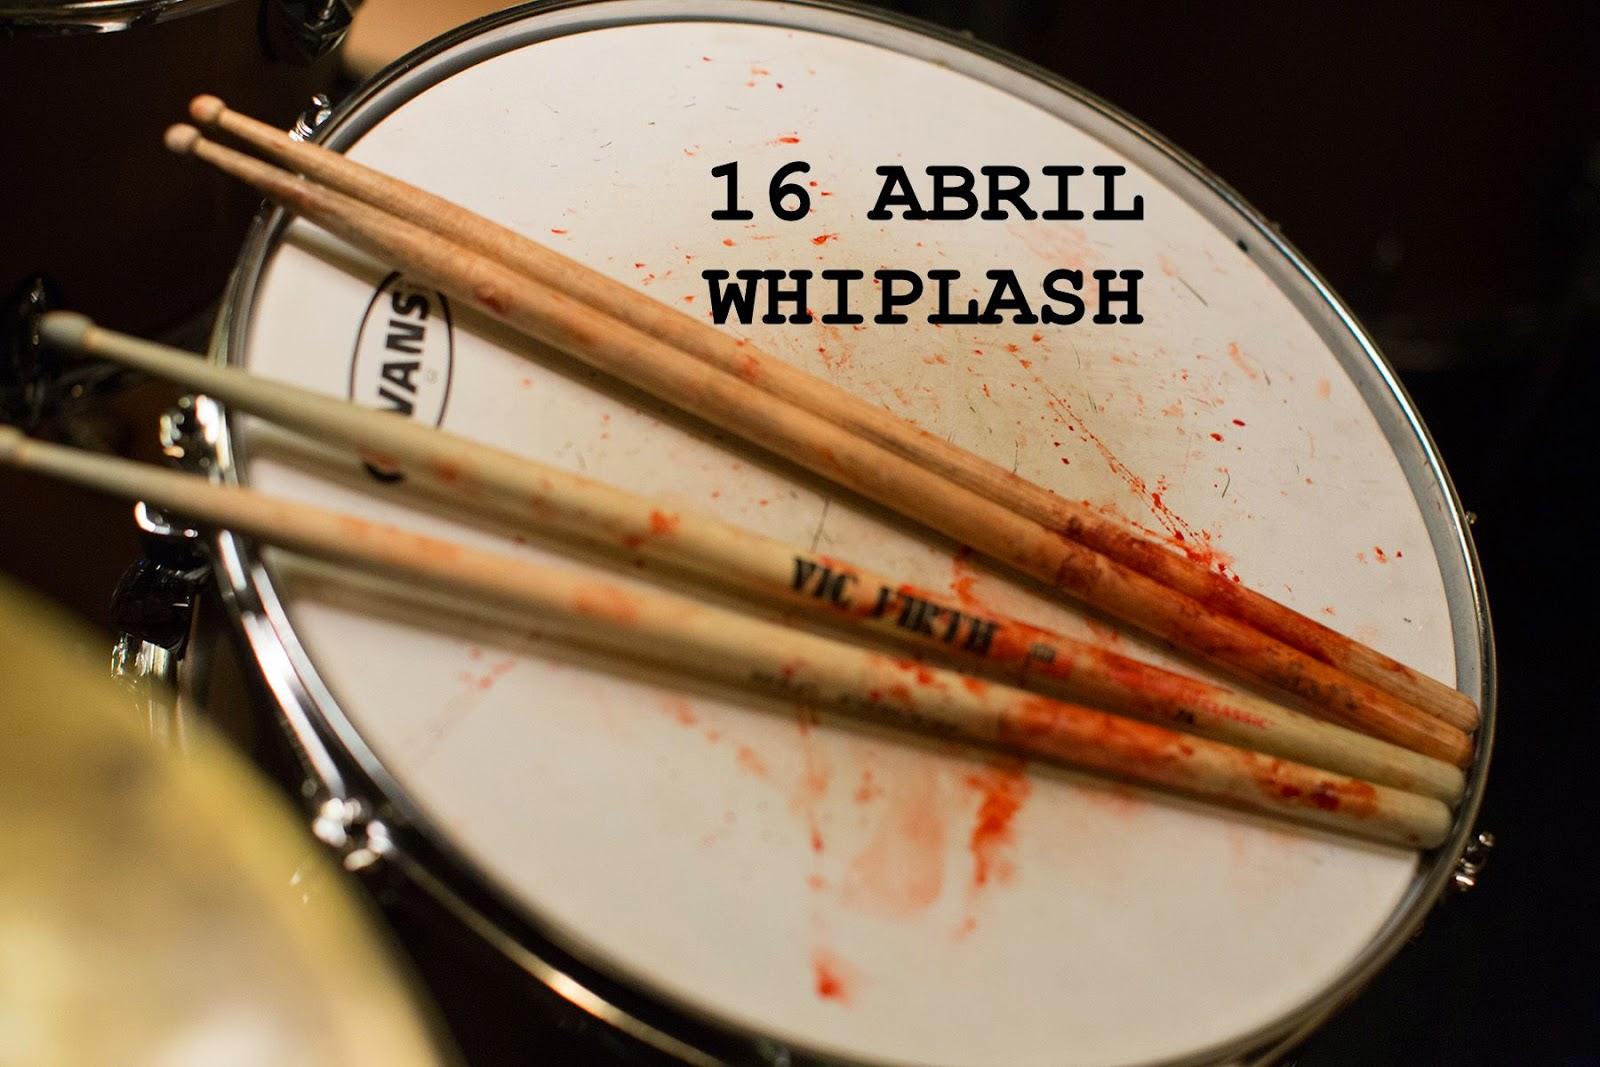 Whiplash - Nos Limites - Whiplash (2014)